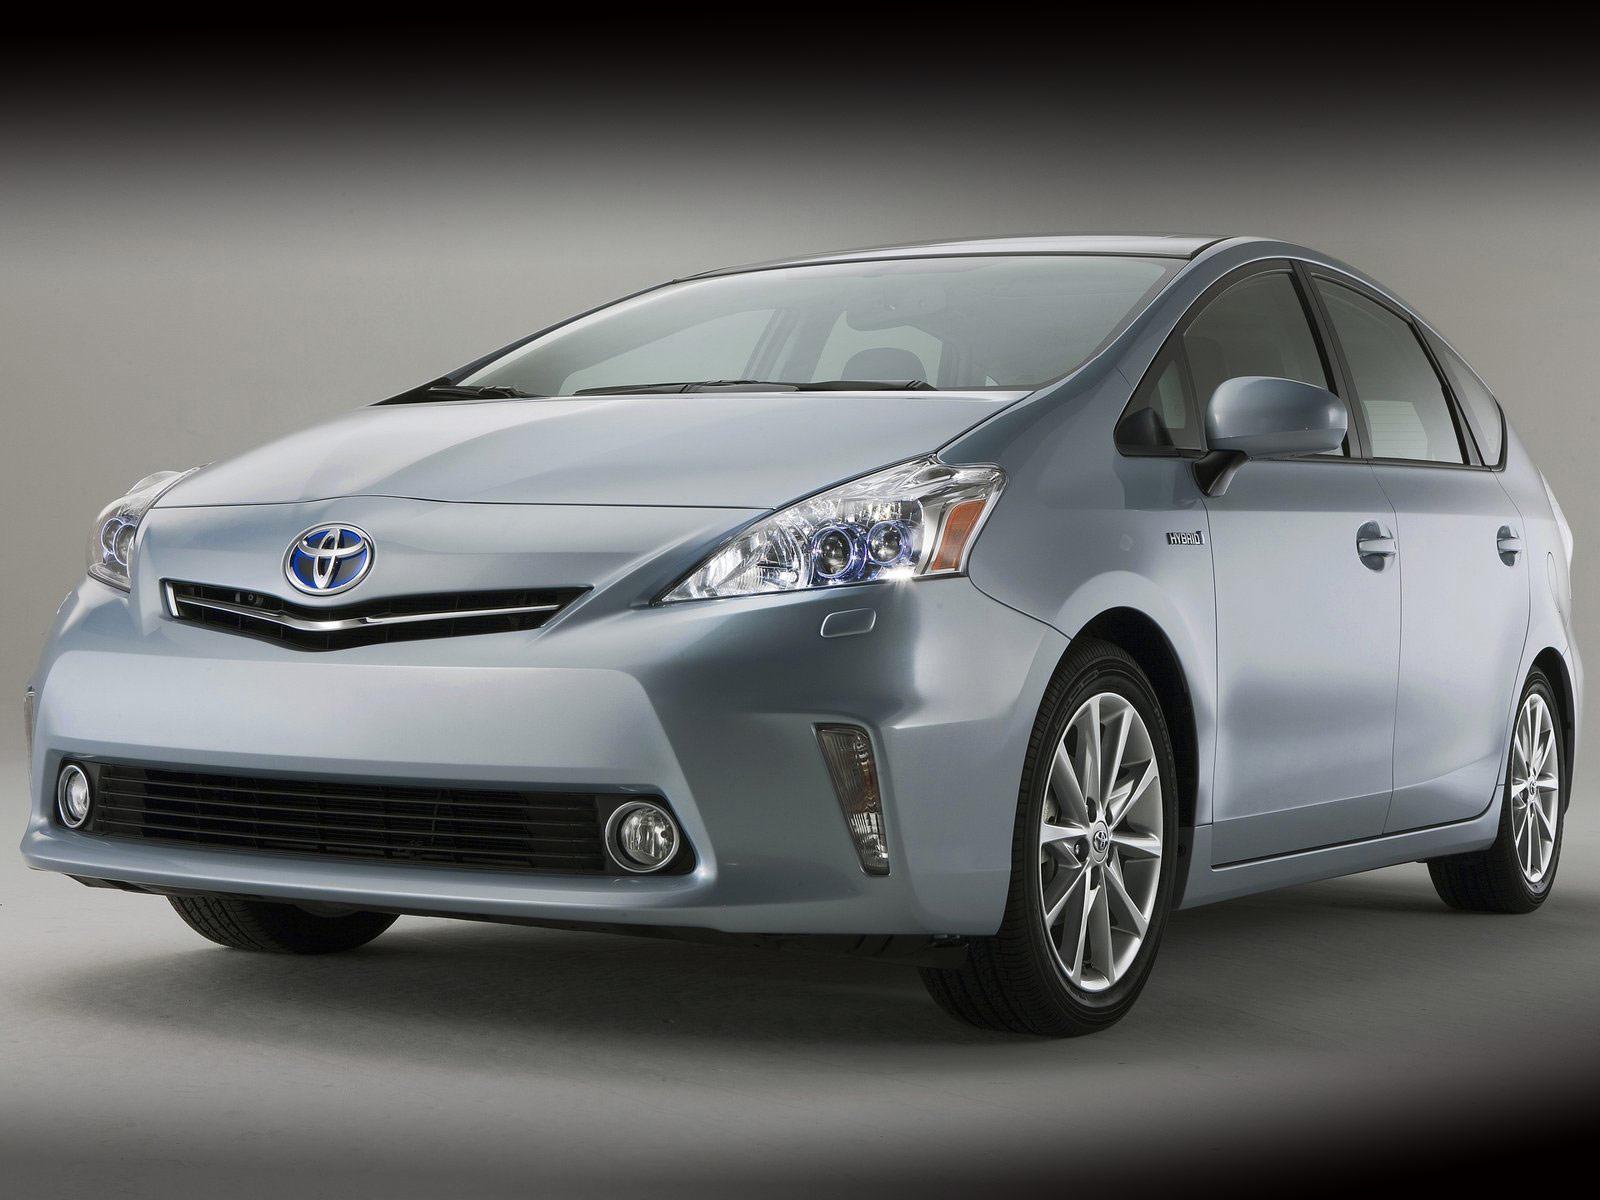 Japanese Car Photos 2012 Toyota Prius V